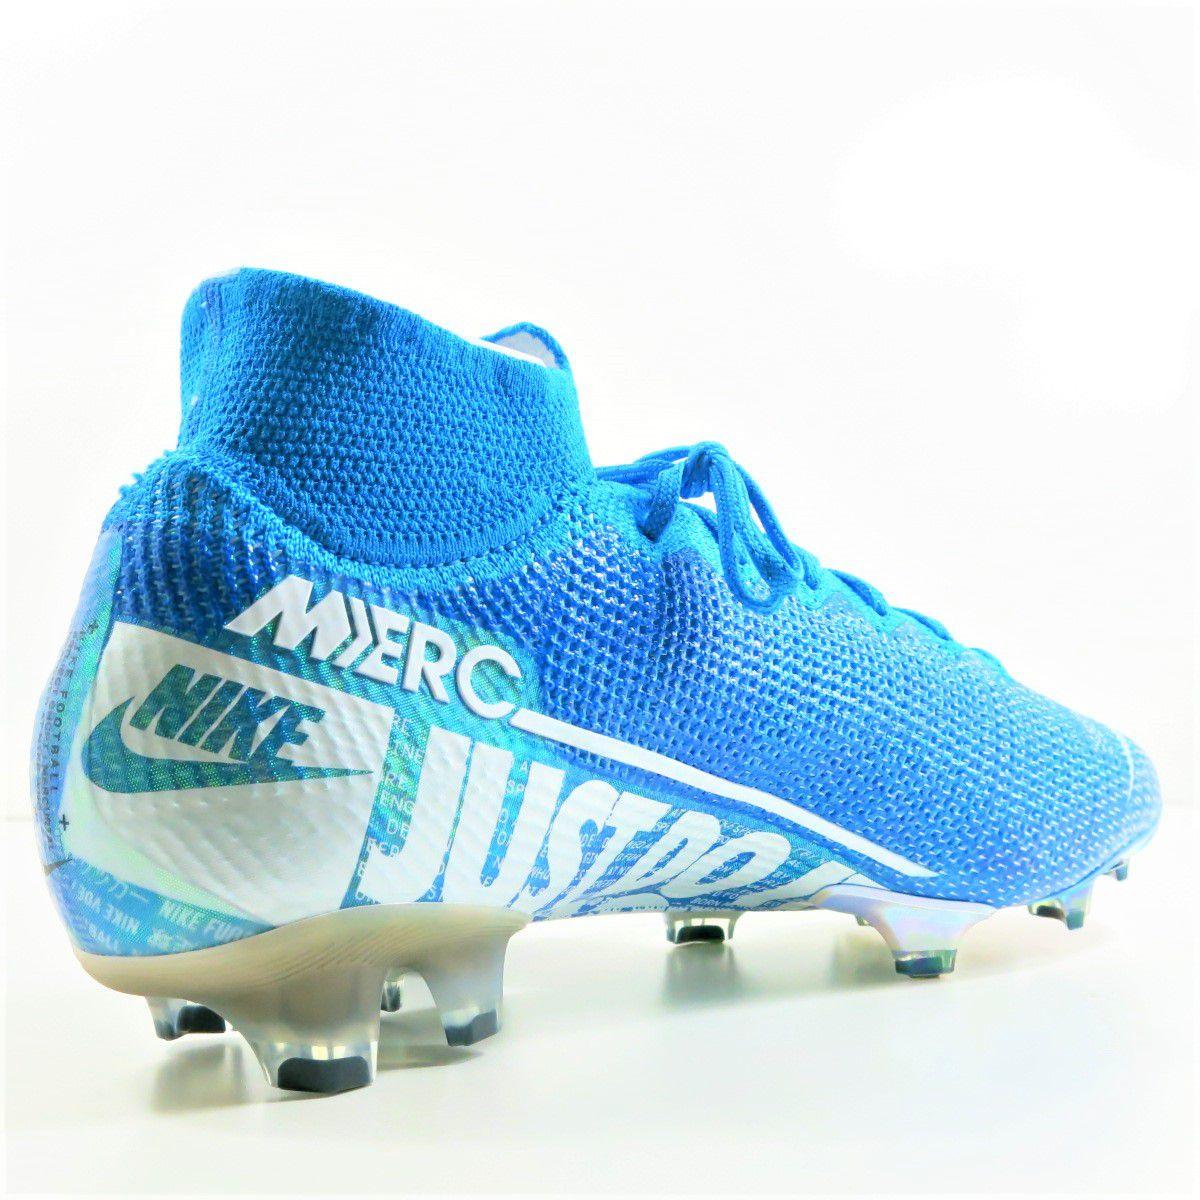 Chuteira Nike Mercurial Superfly VII Elite FG